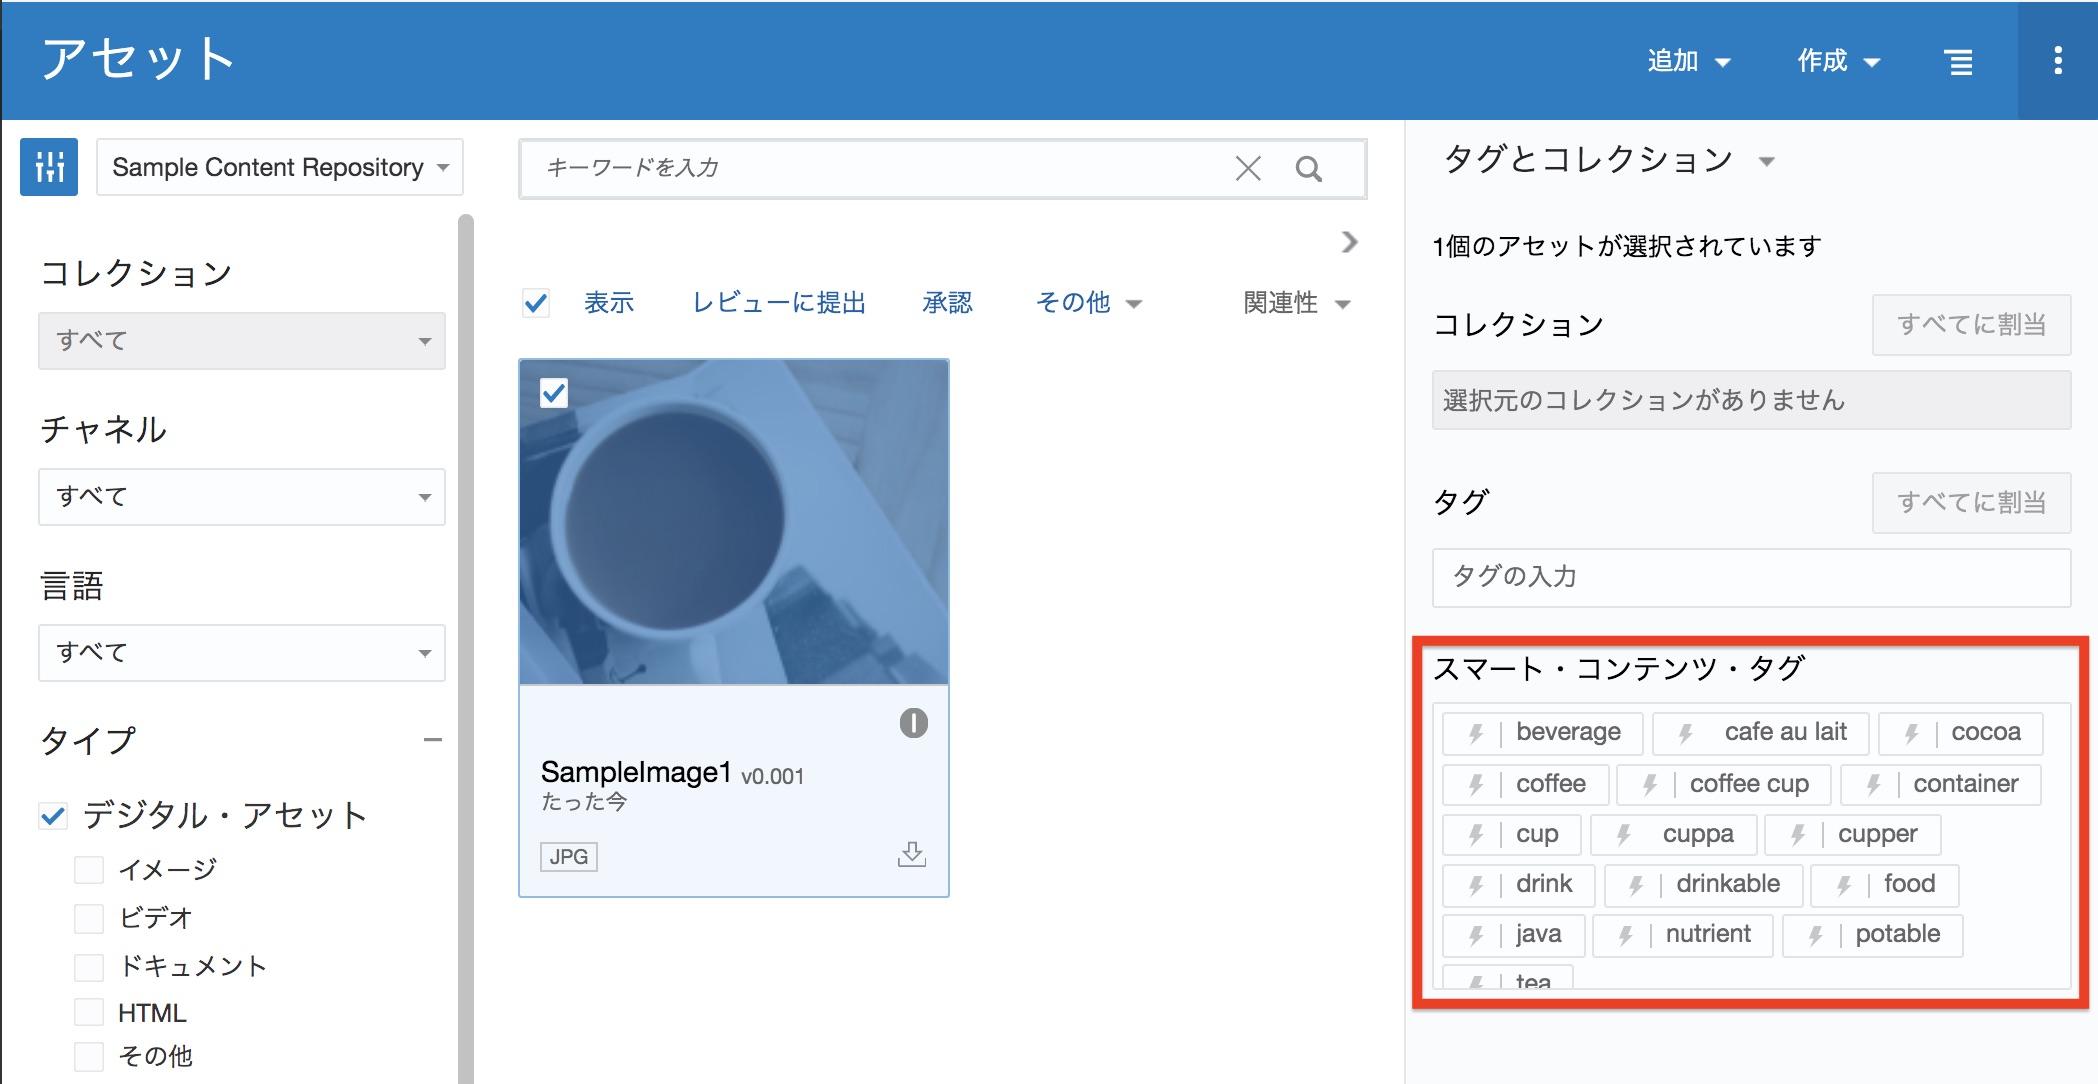 image_oce33.jpg